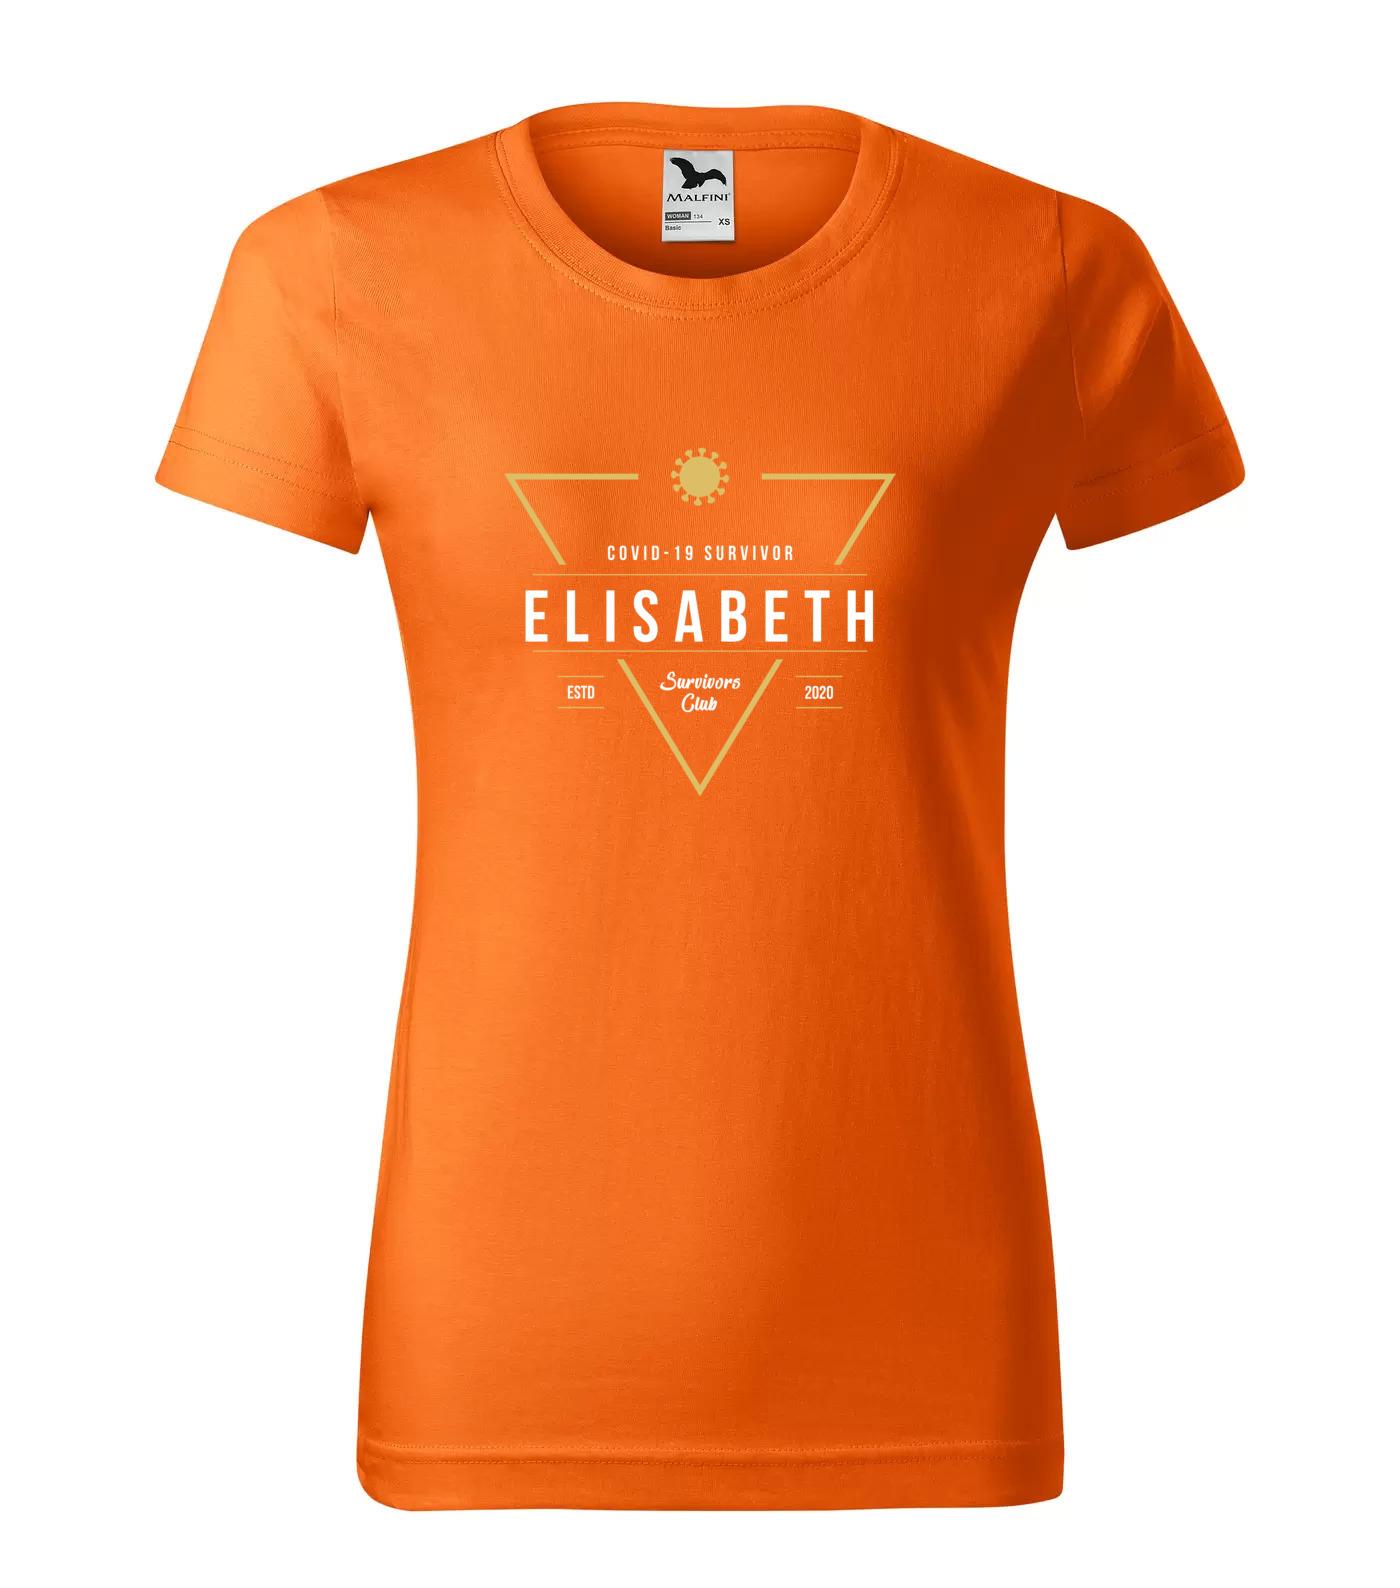 Tričko Survivor Club Elisabeth